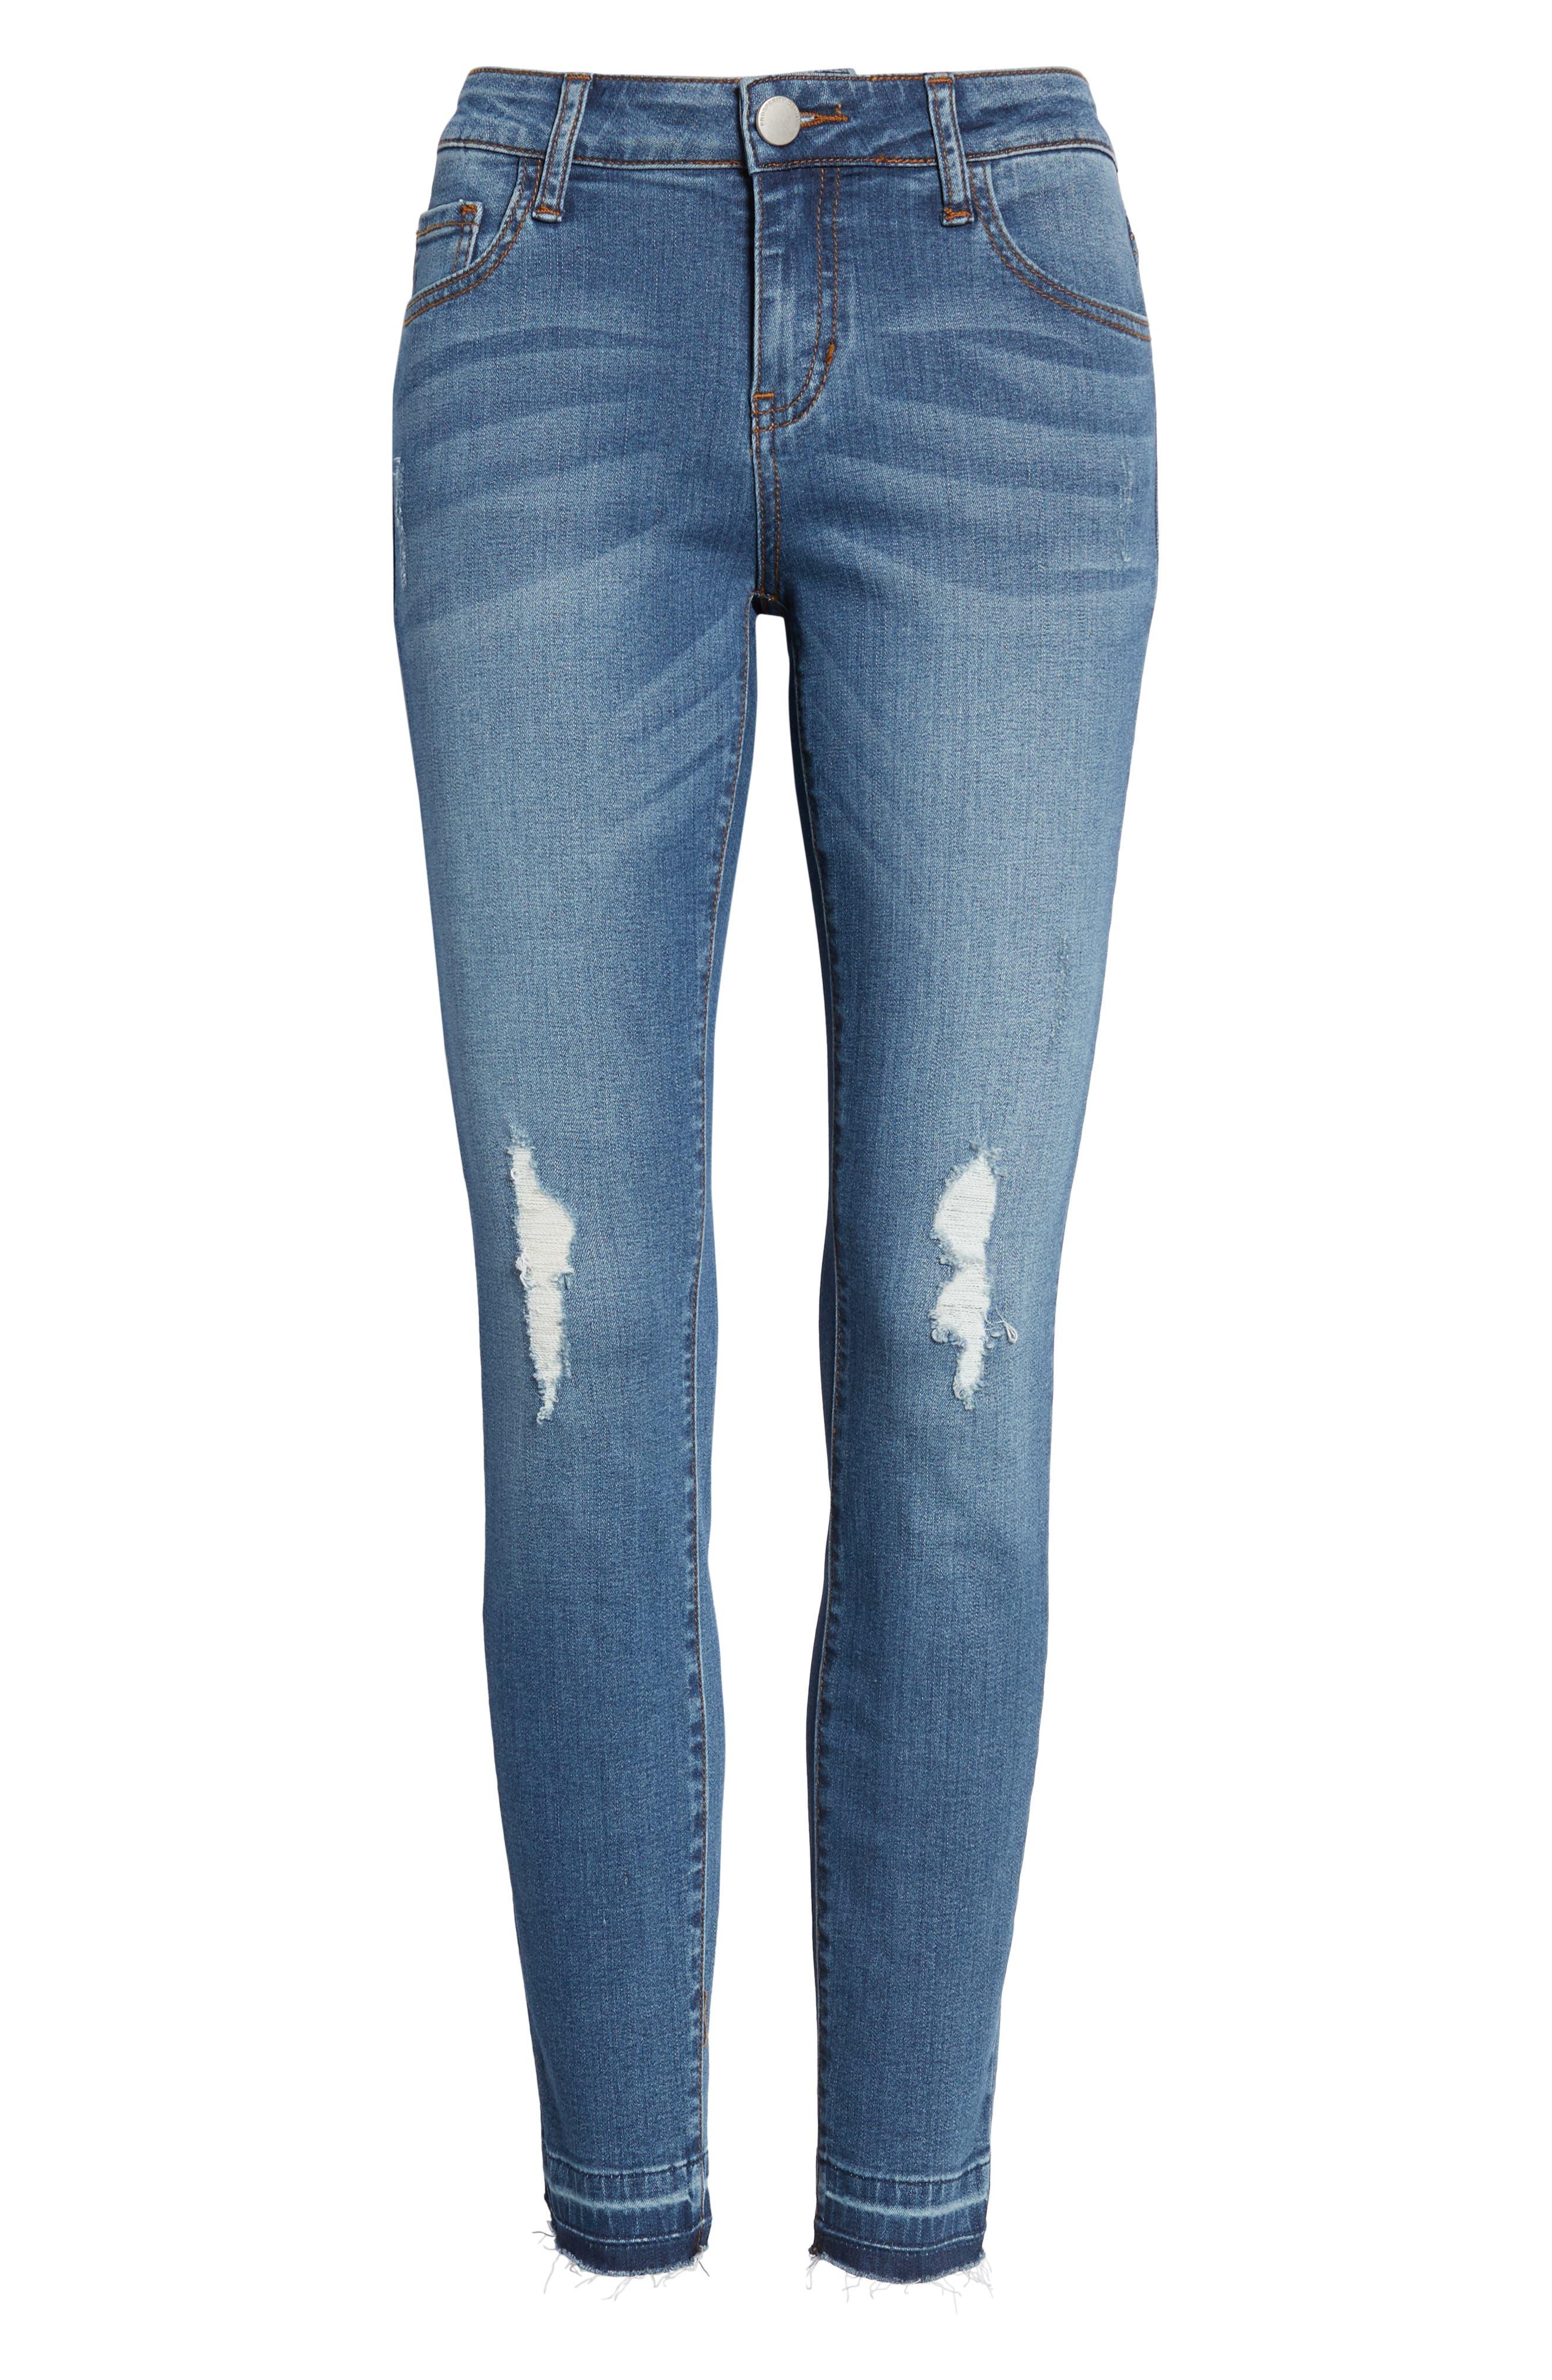 Release Hem Skinny Jeans,                             Alternate thumbnail 7, color,                             Pretty